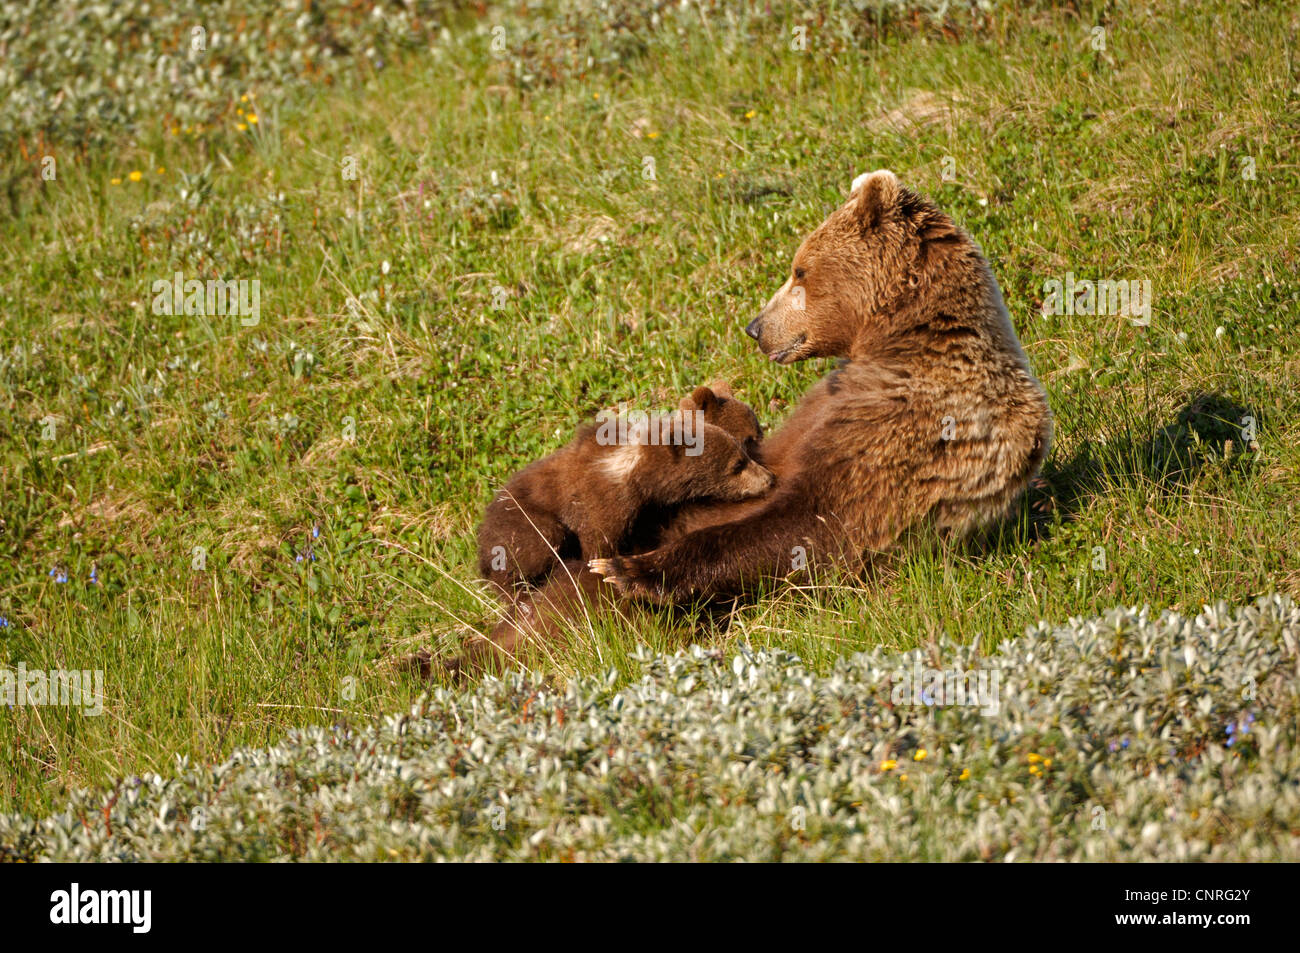 brown bear, grizzly bear (Ursus arctos horribilis), sucklings twins, USA, Alaska, Denali Nationalpark Stock Photo